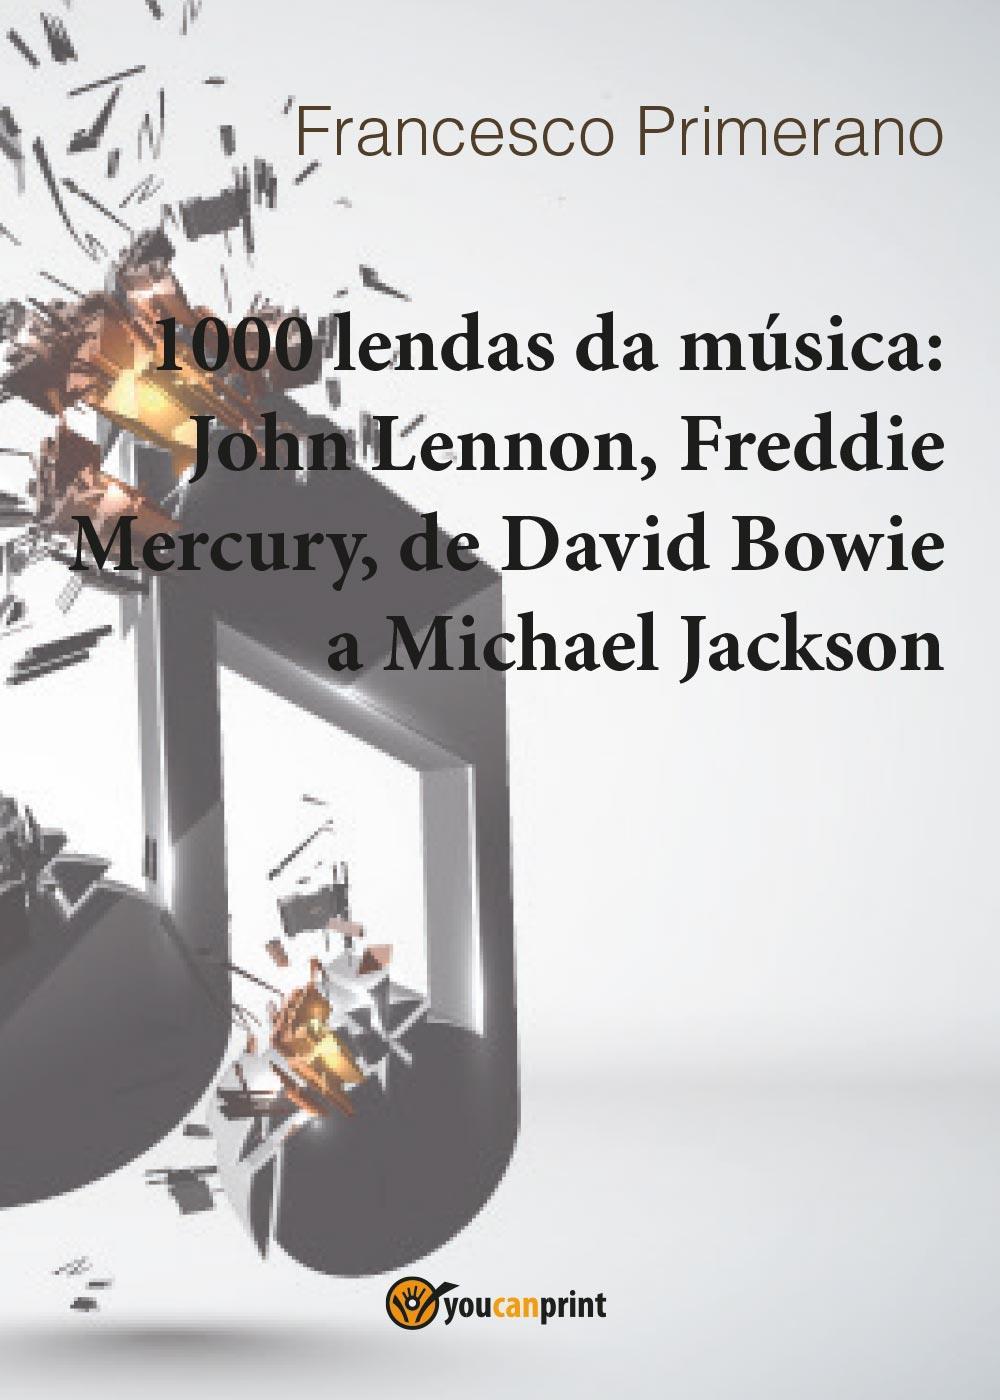 1000 lendas da música: John Lennon, Freddie Mercury, de David Bowie a Michael Jackson